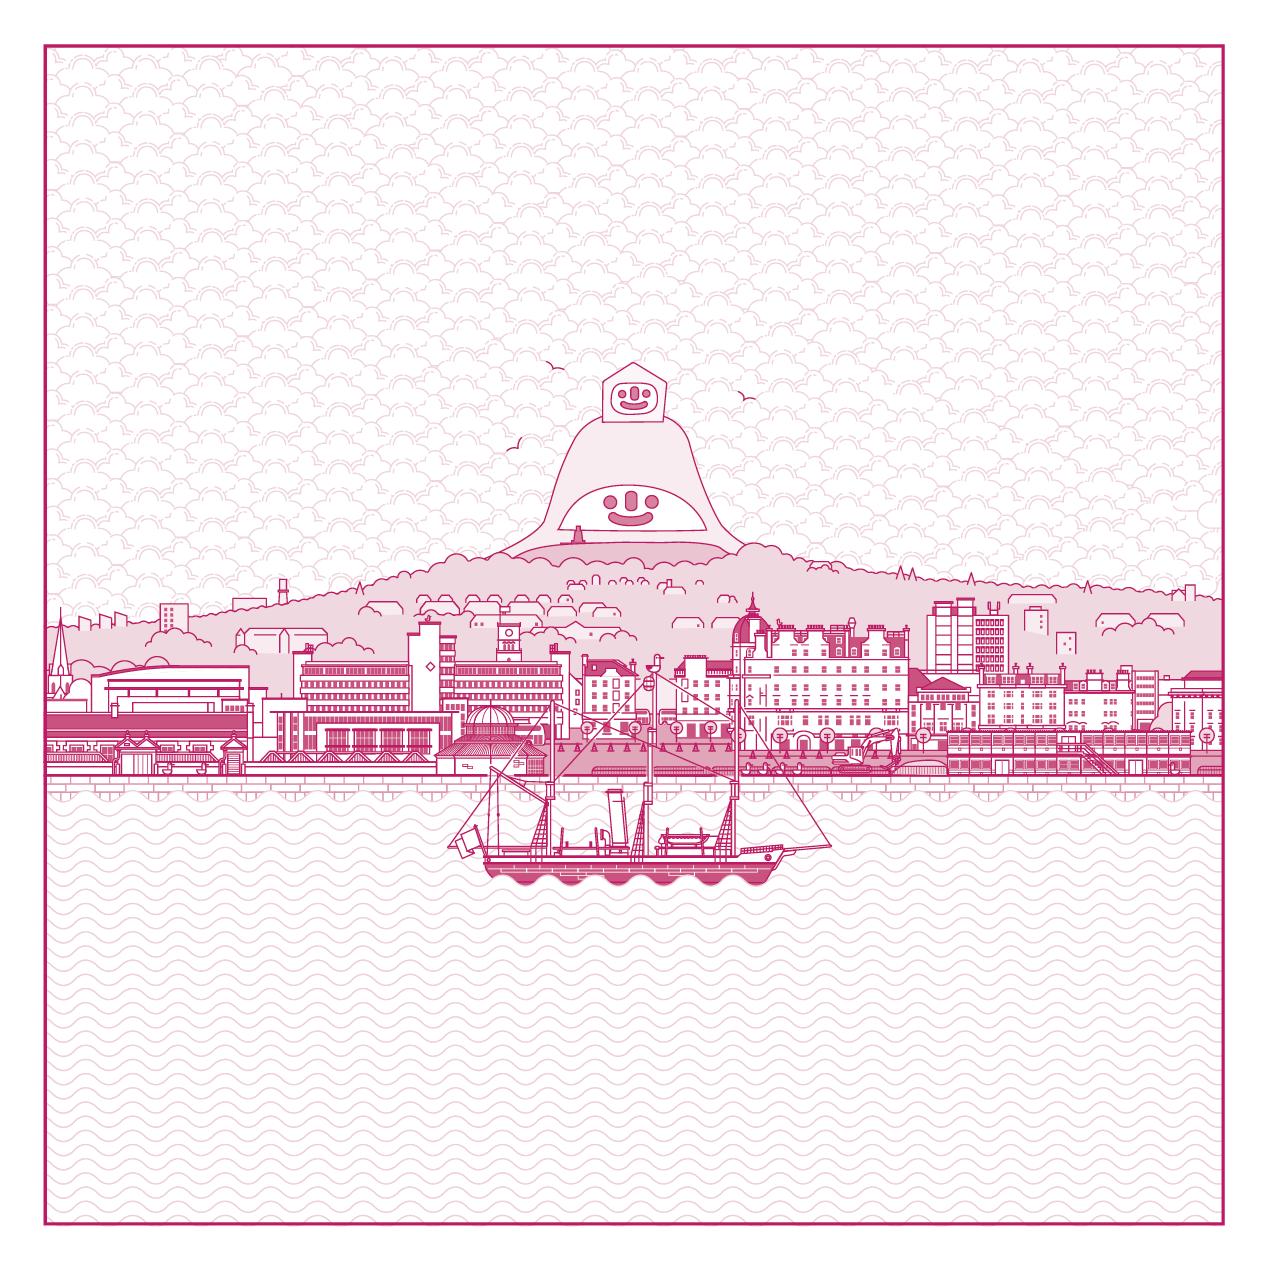 UNESCO City of Design Illustration